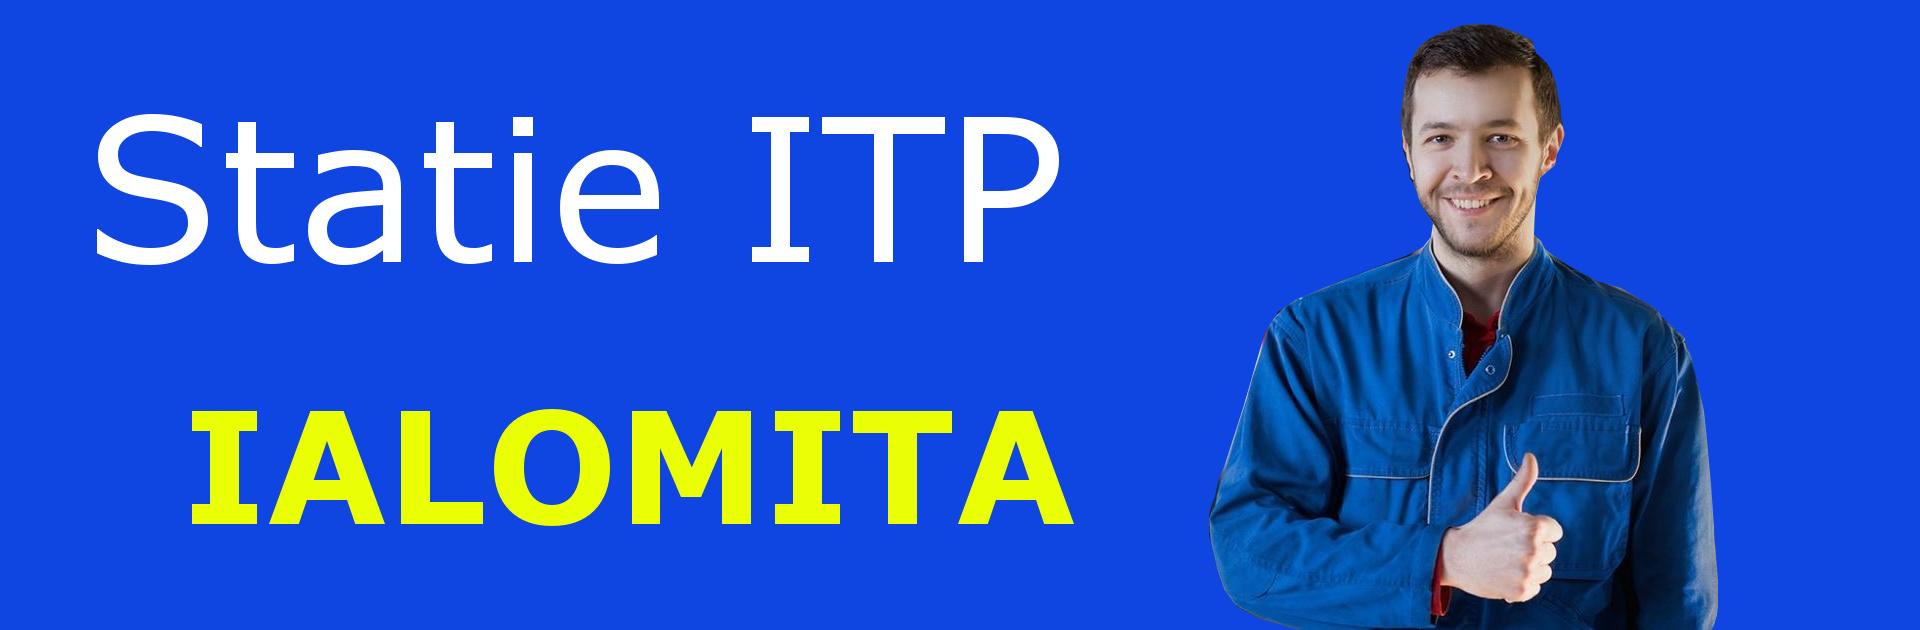 Banner ITP IALOMITA